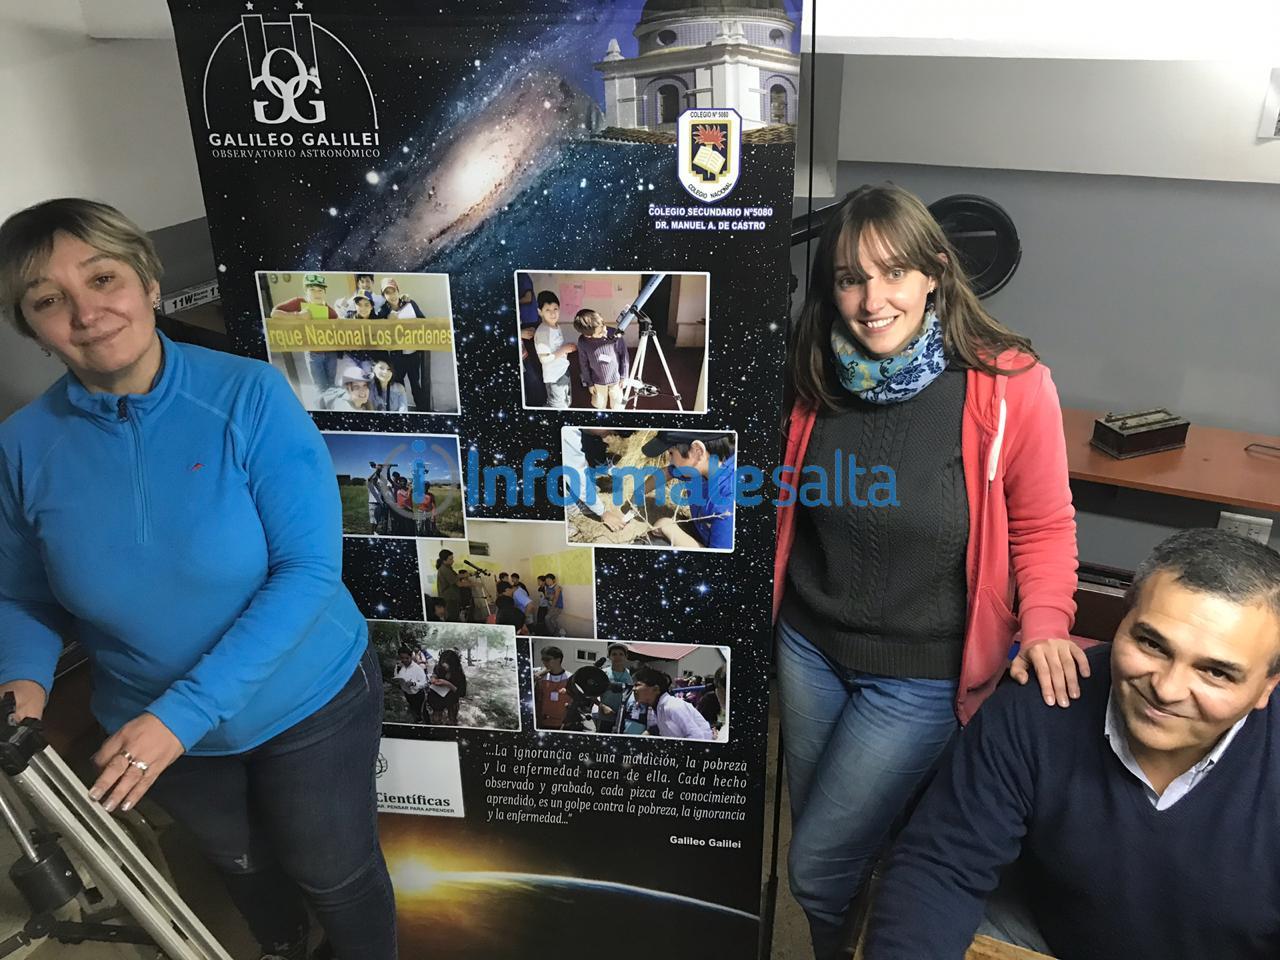 OBSERVATORIO GALILEO GALILEI